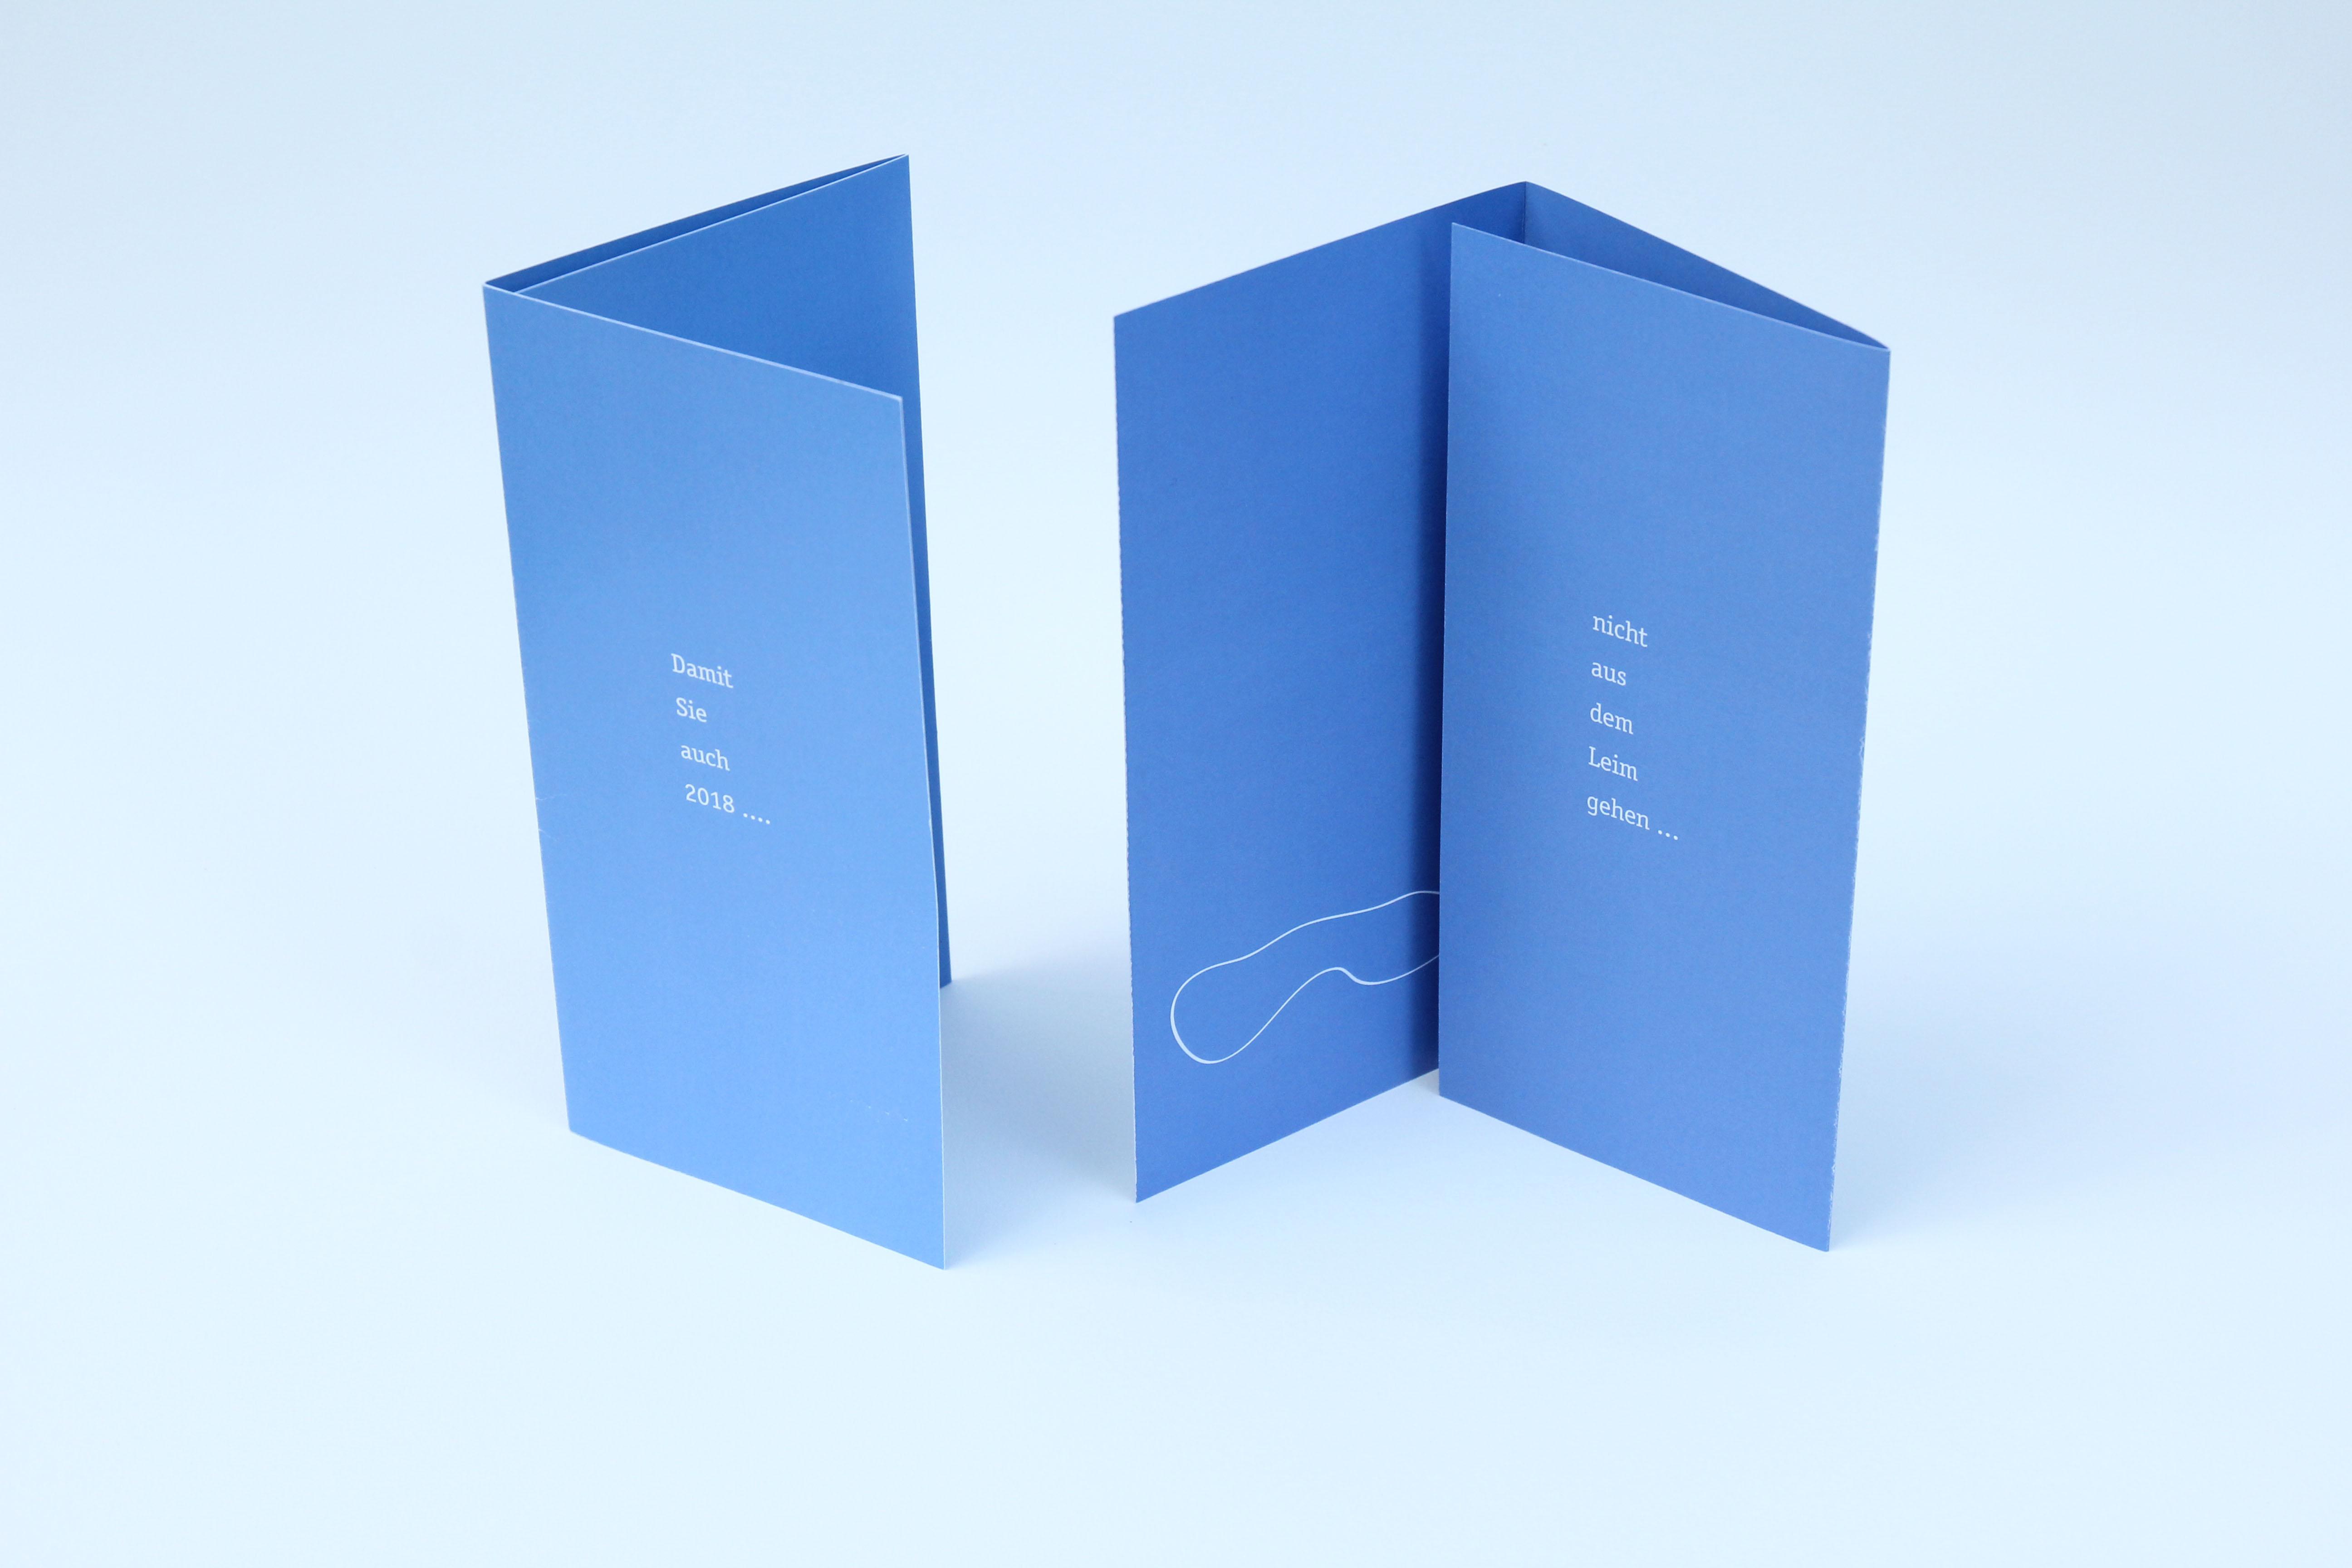 New Years Card 5 for a Carpenter by Daniela Franz - Creative Work